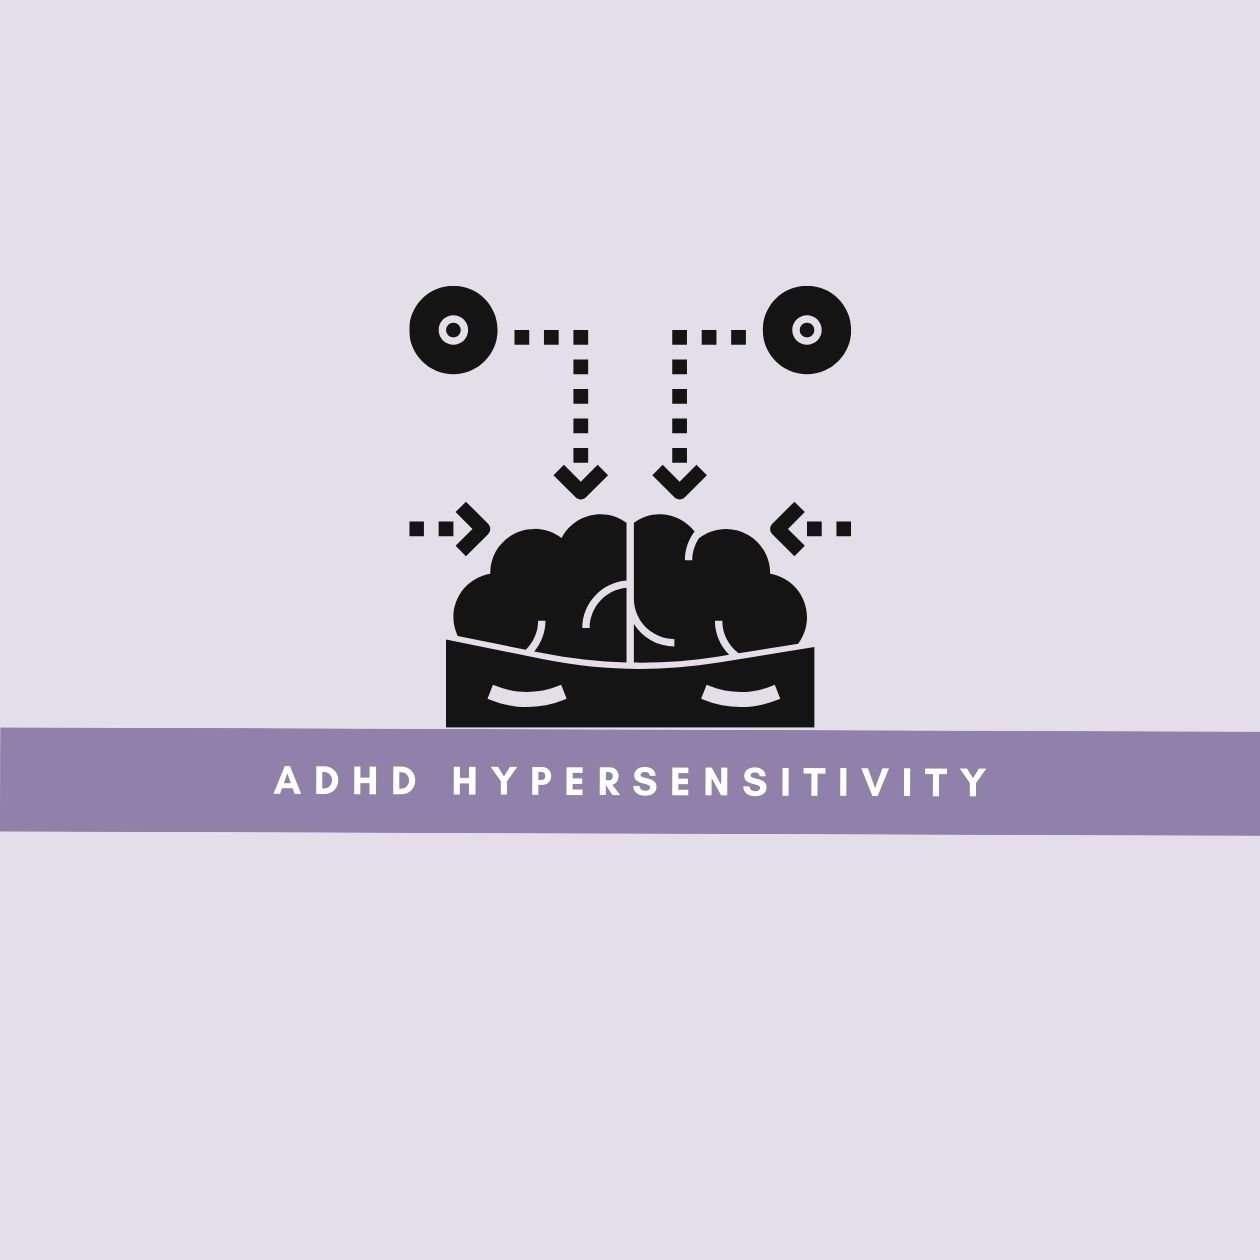 Adhd hypersensitivity: an illustration